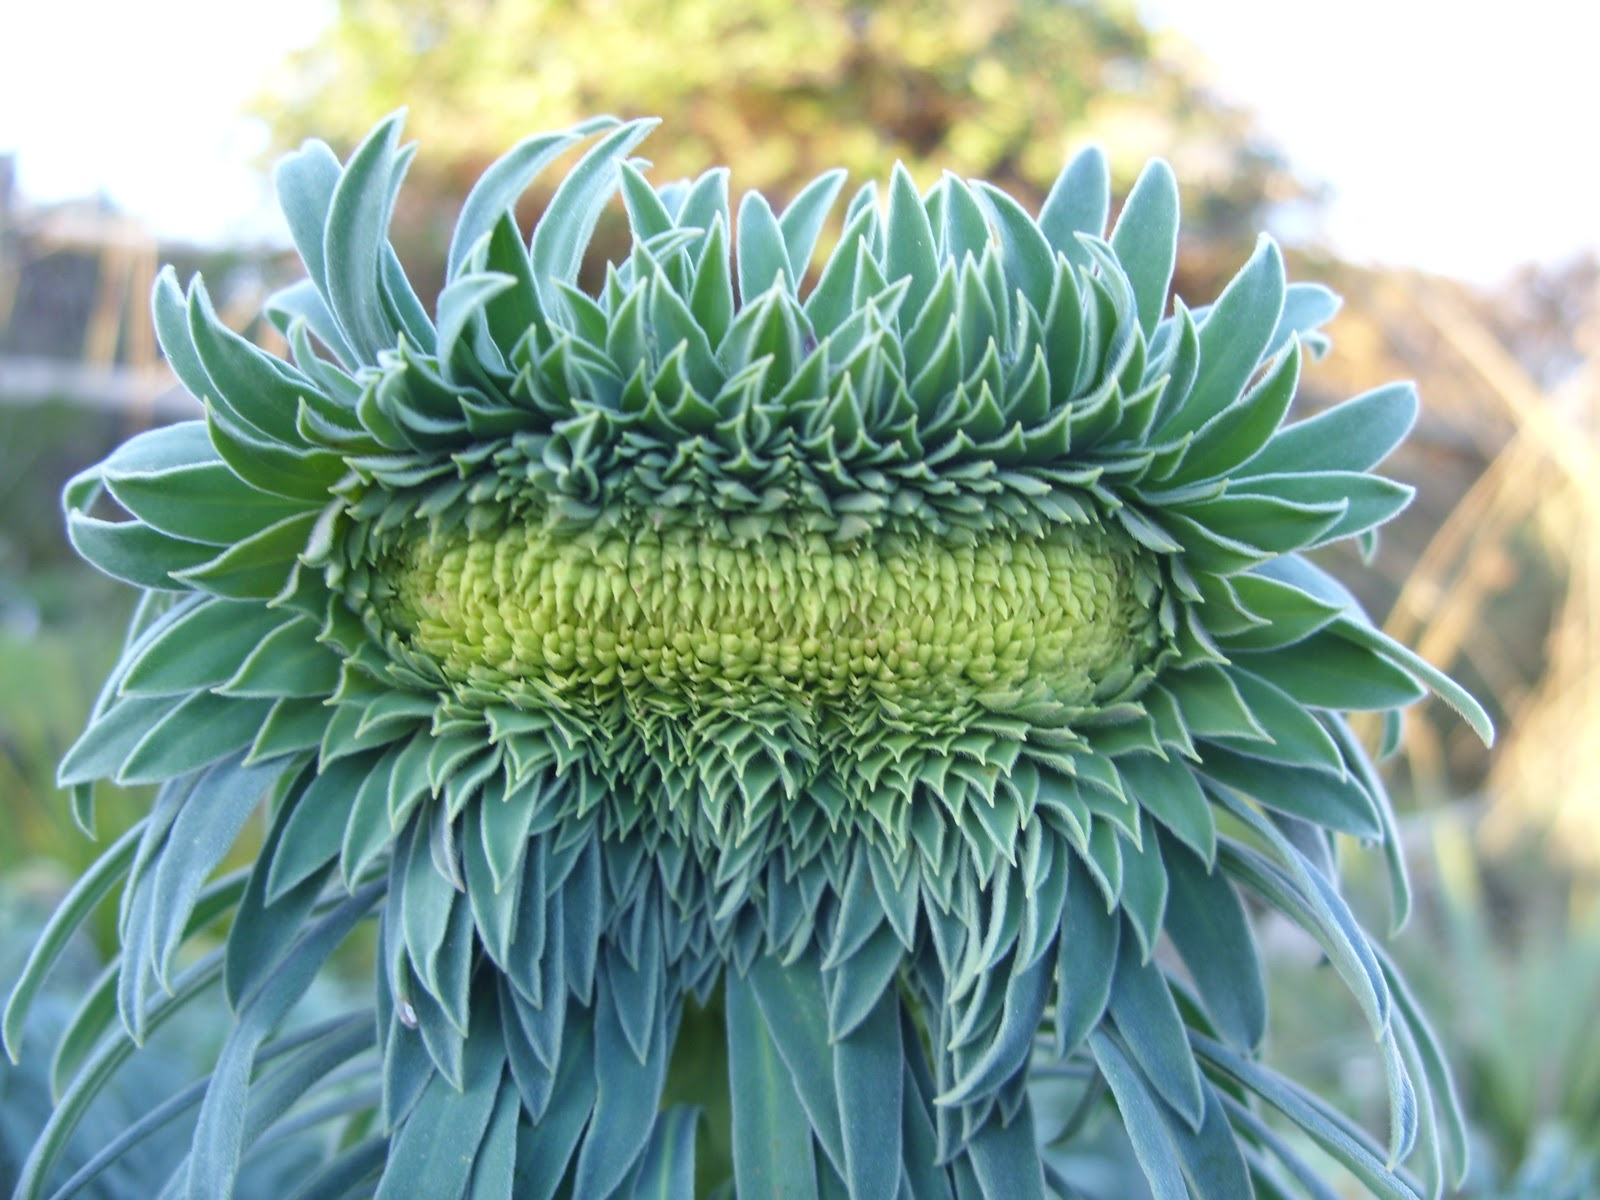 http://ernieandi.blogspot.com/2011/01/fascinationg-fasciation.html